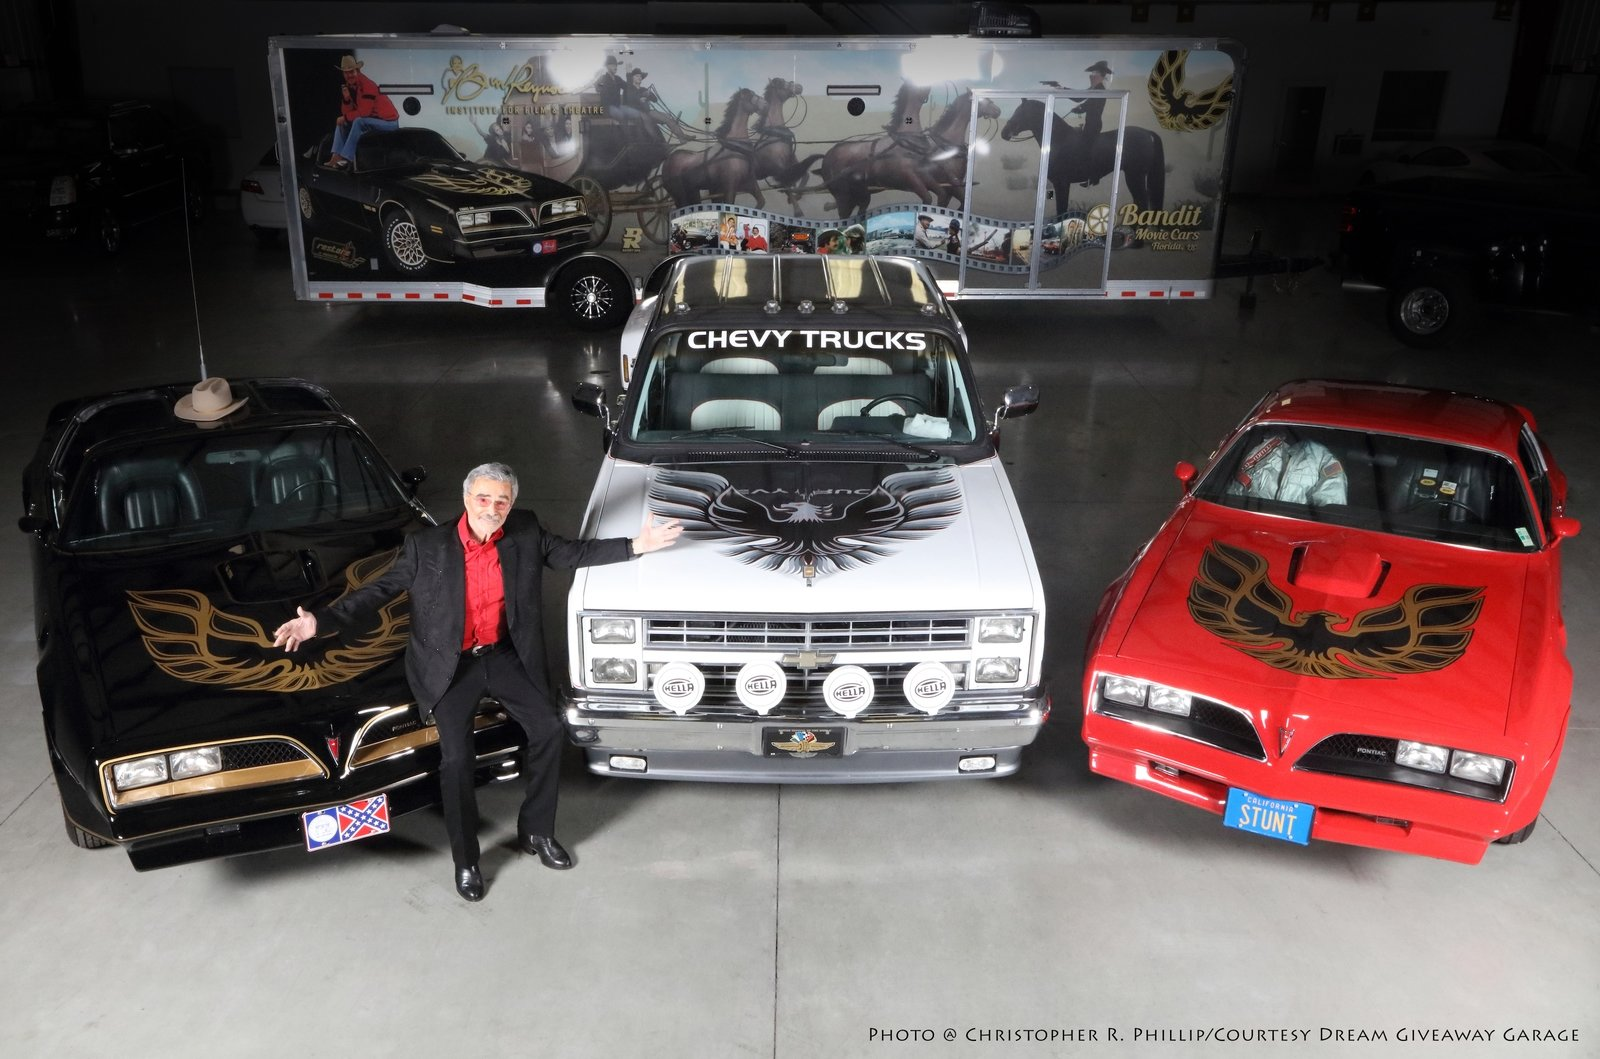 Three Burt Reynolds Movie Cars Sell For 330k In Vegas